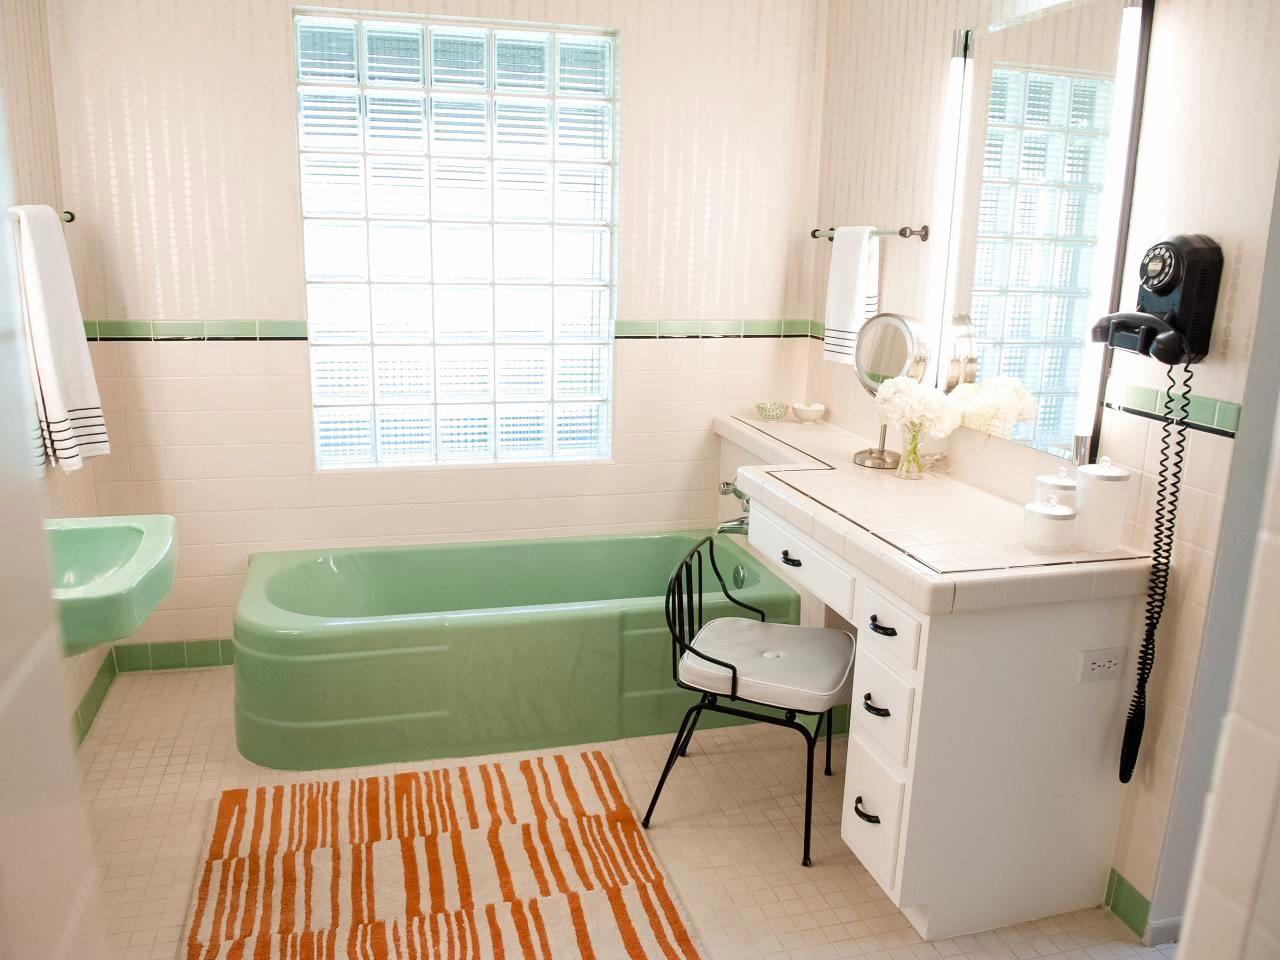 30 Awesome Mid Century Modern Bathroom Ideas You Should See This Year Mid Century Bathroom Modern Bathroom Mid Century Modern Bathroom